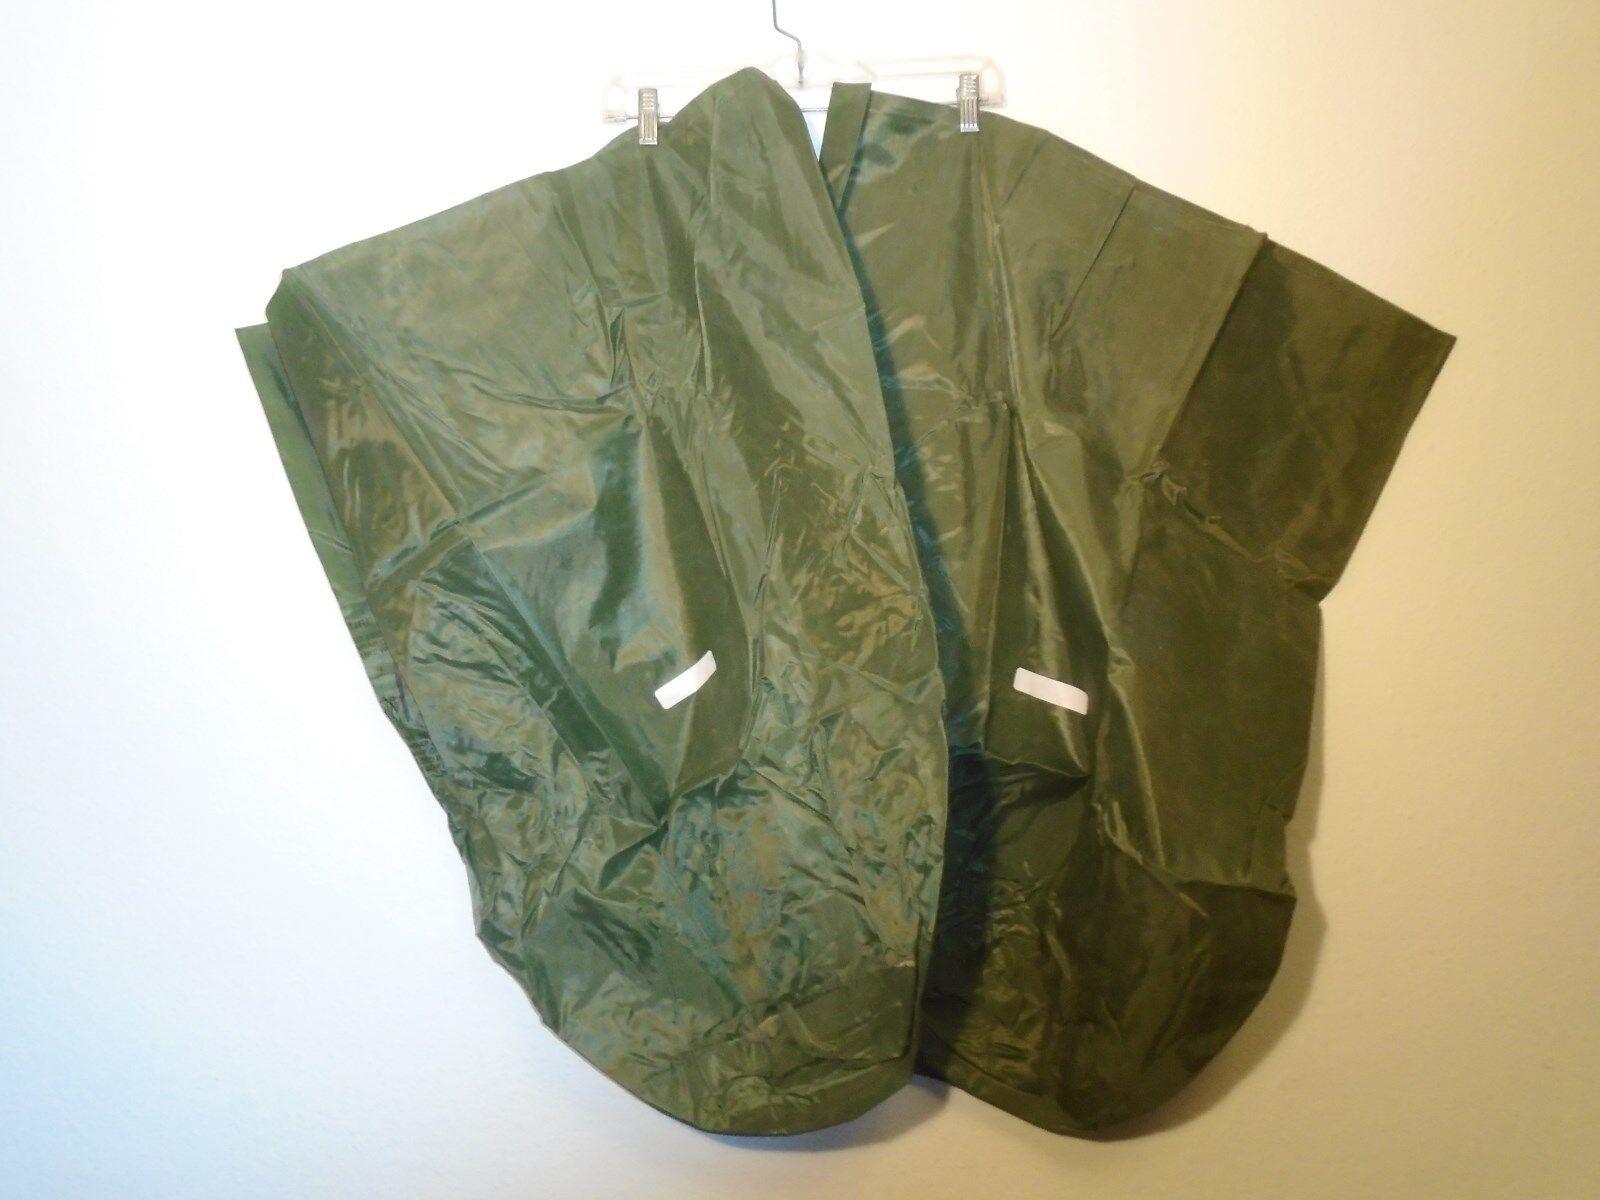 2 GENUINE USGI MILITARY SURPLUS WATER PROOF CLOTHING BARRACKS BAGS ALICE NEW